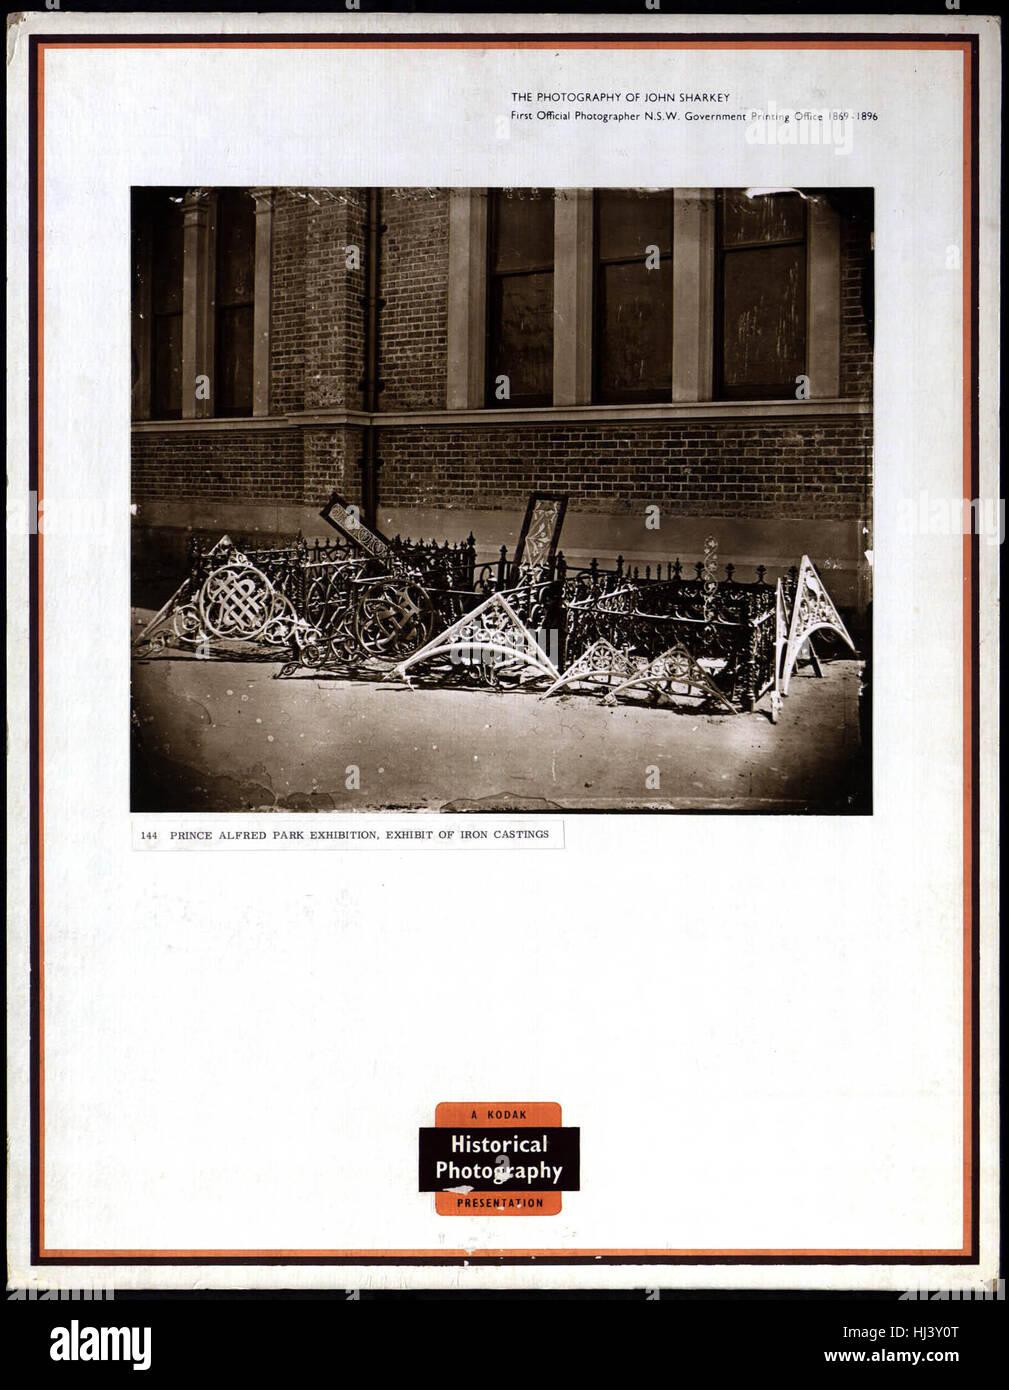 'Prince Albert Exhibition - Cast Iron Exhibition' John Sharkey - Stock Image